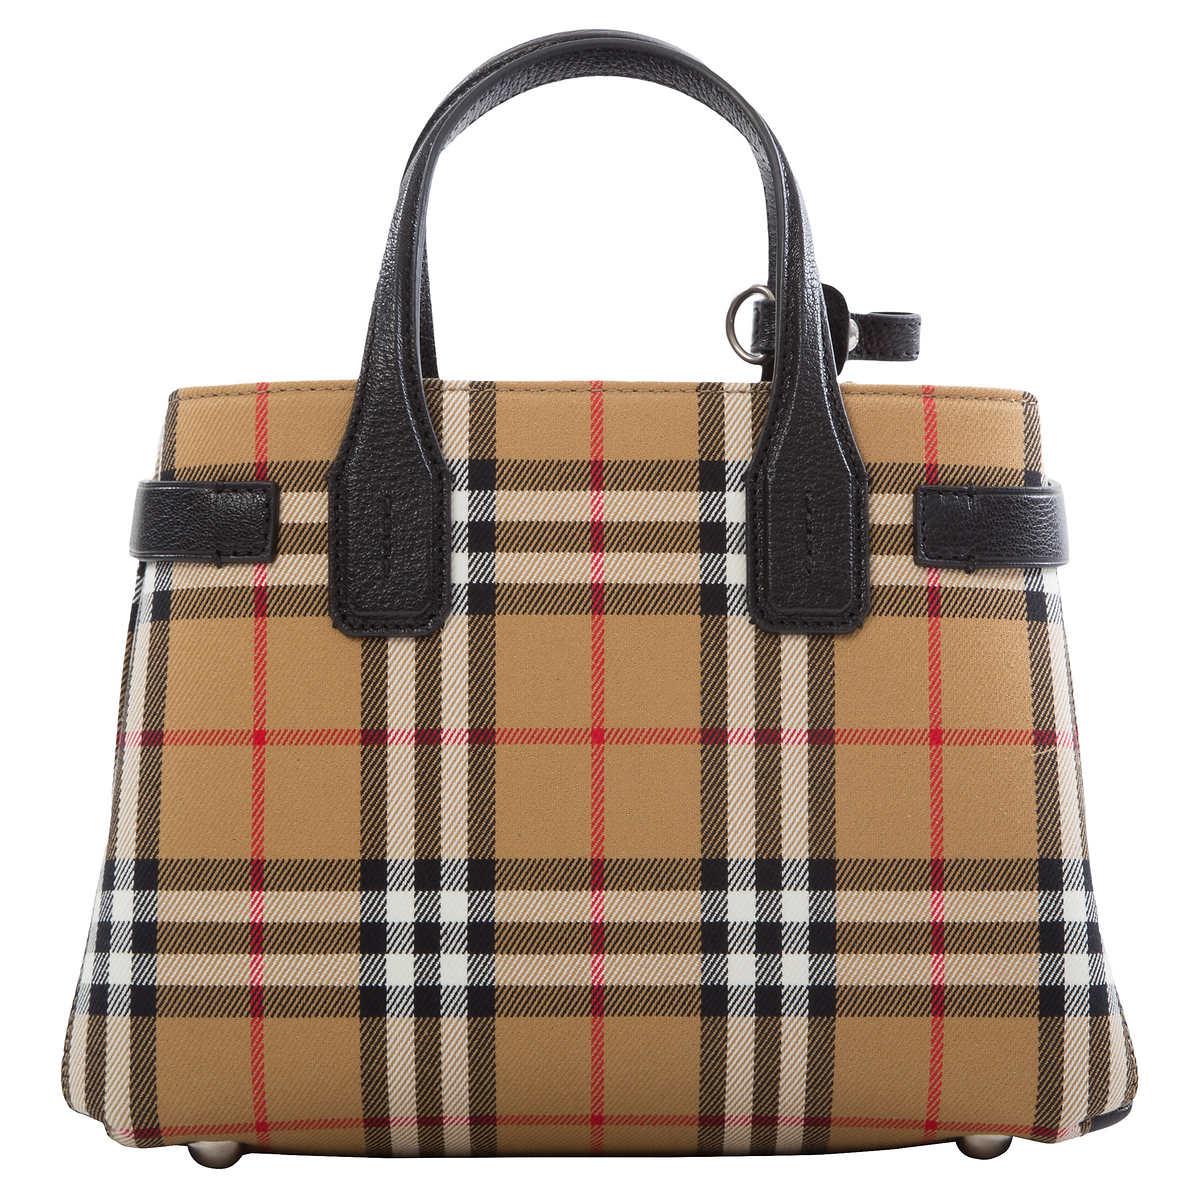 3e6e6c8b22a3 Burberry Small Banner Vintage Check Bag, Vintage Check